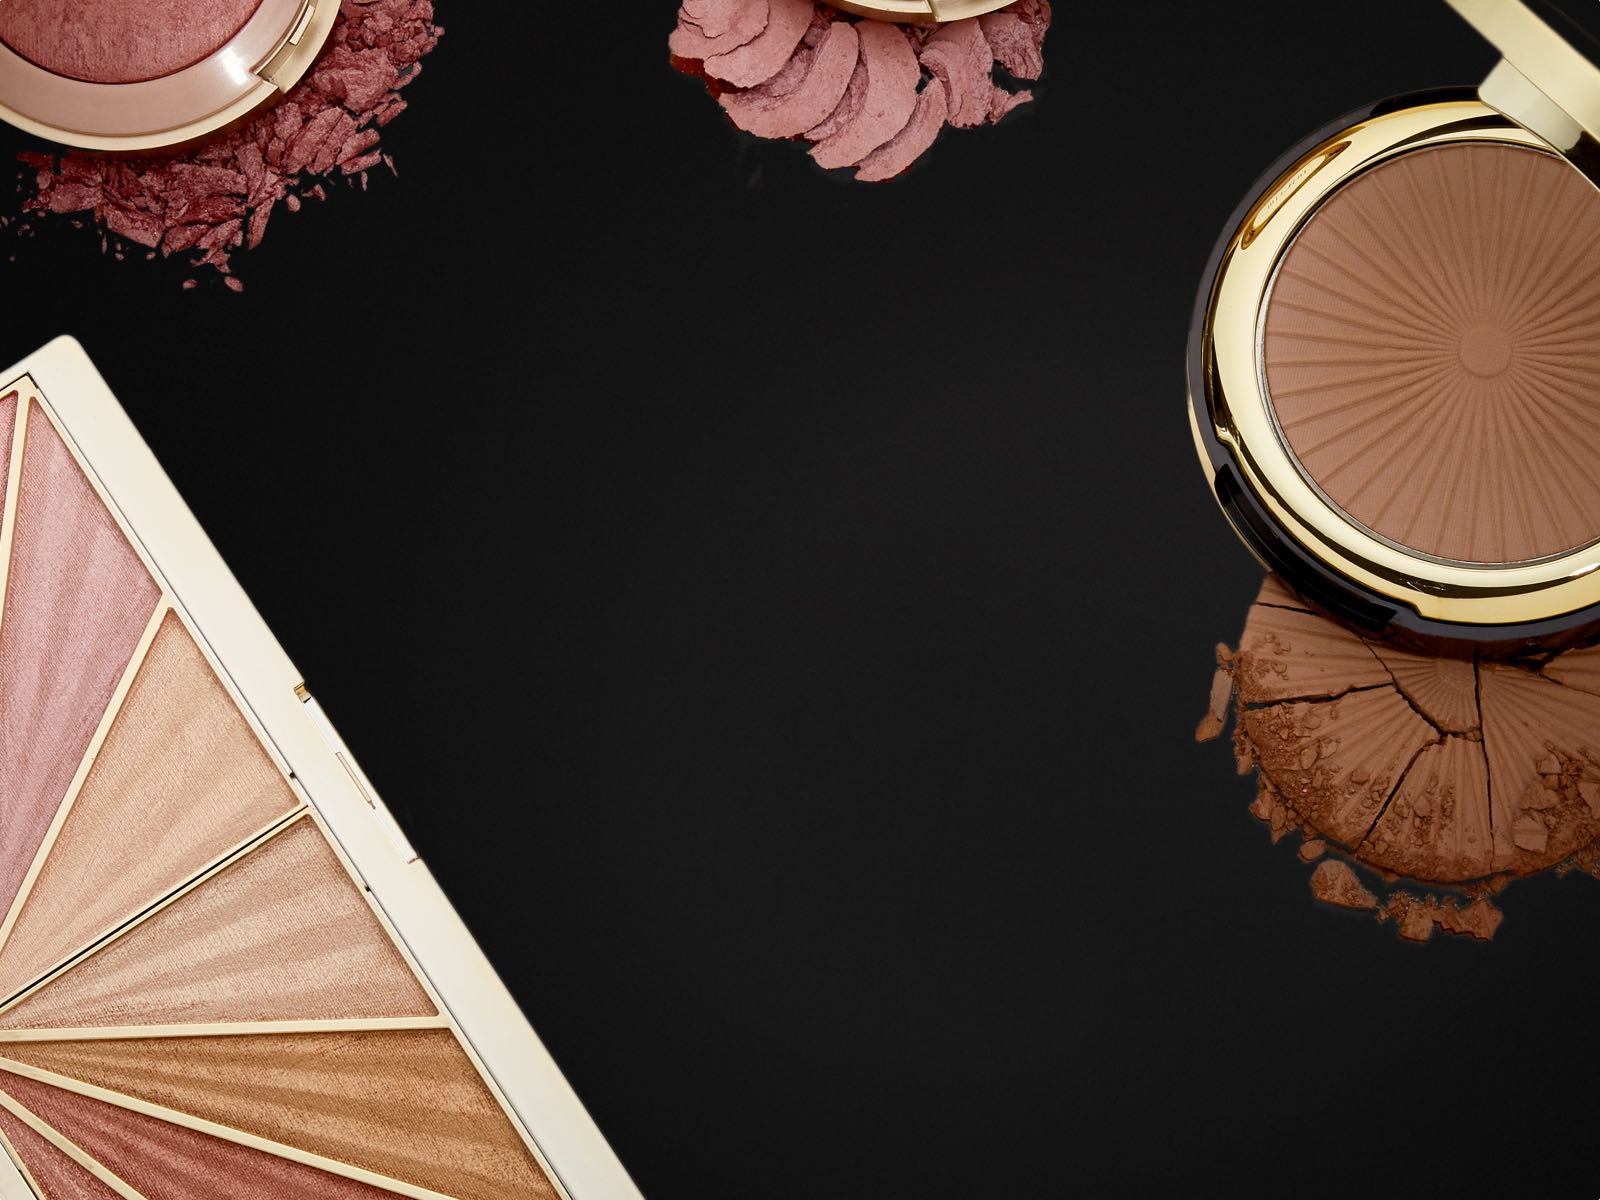 Milani Cosmetics - Conceal + Perfect Longwear Concealer